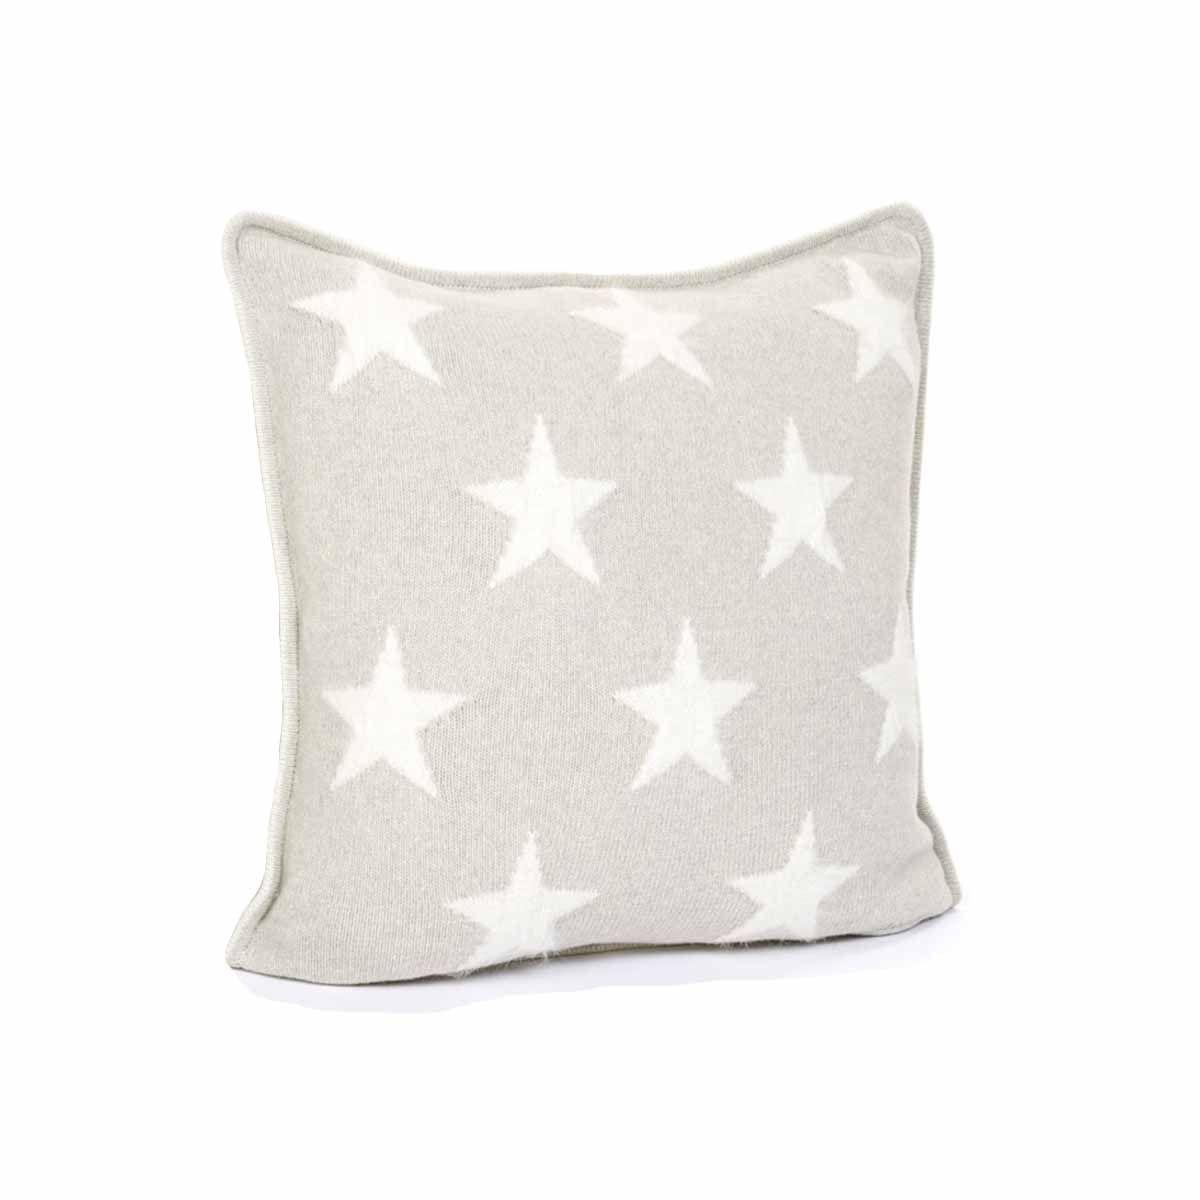 Gant Angora Ten Star Kissenbezug 50 X 50 Cm Soft Grey Melange Mit